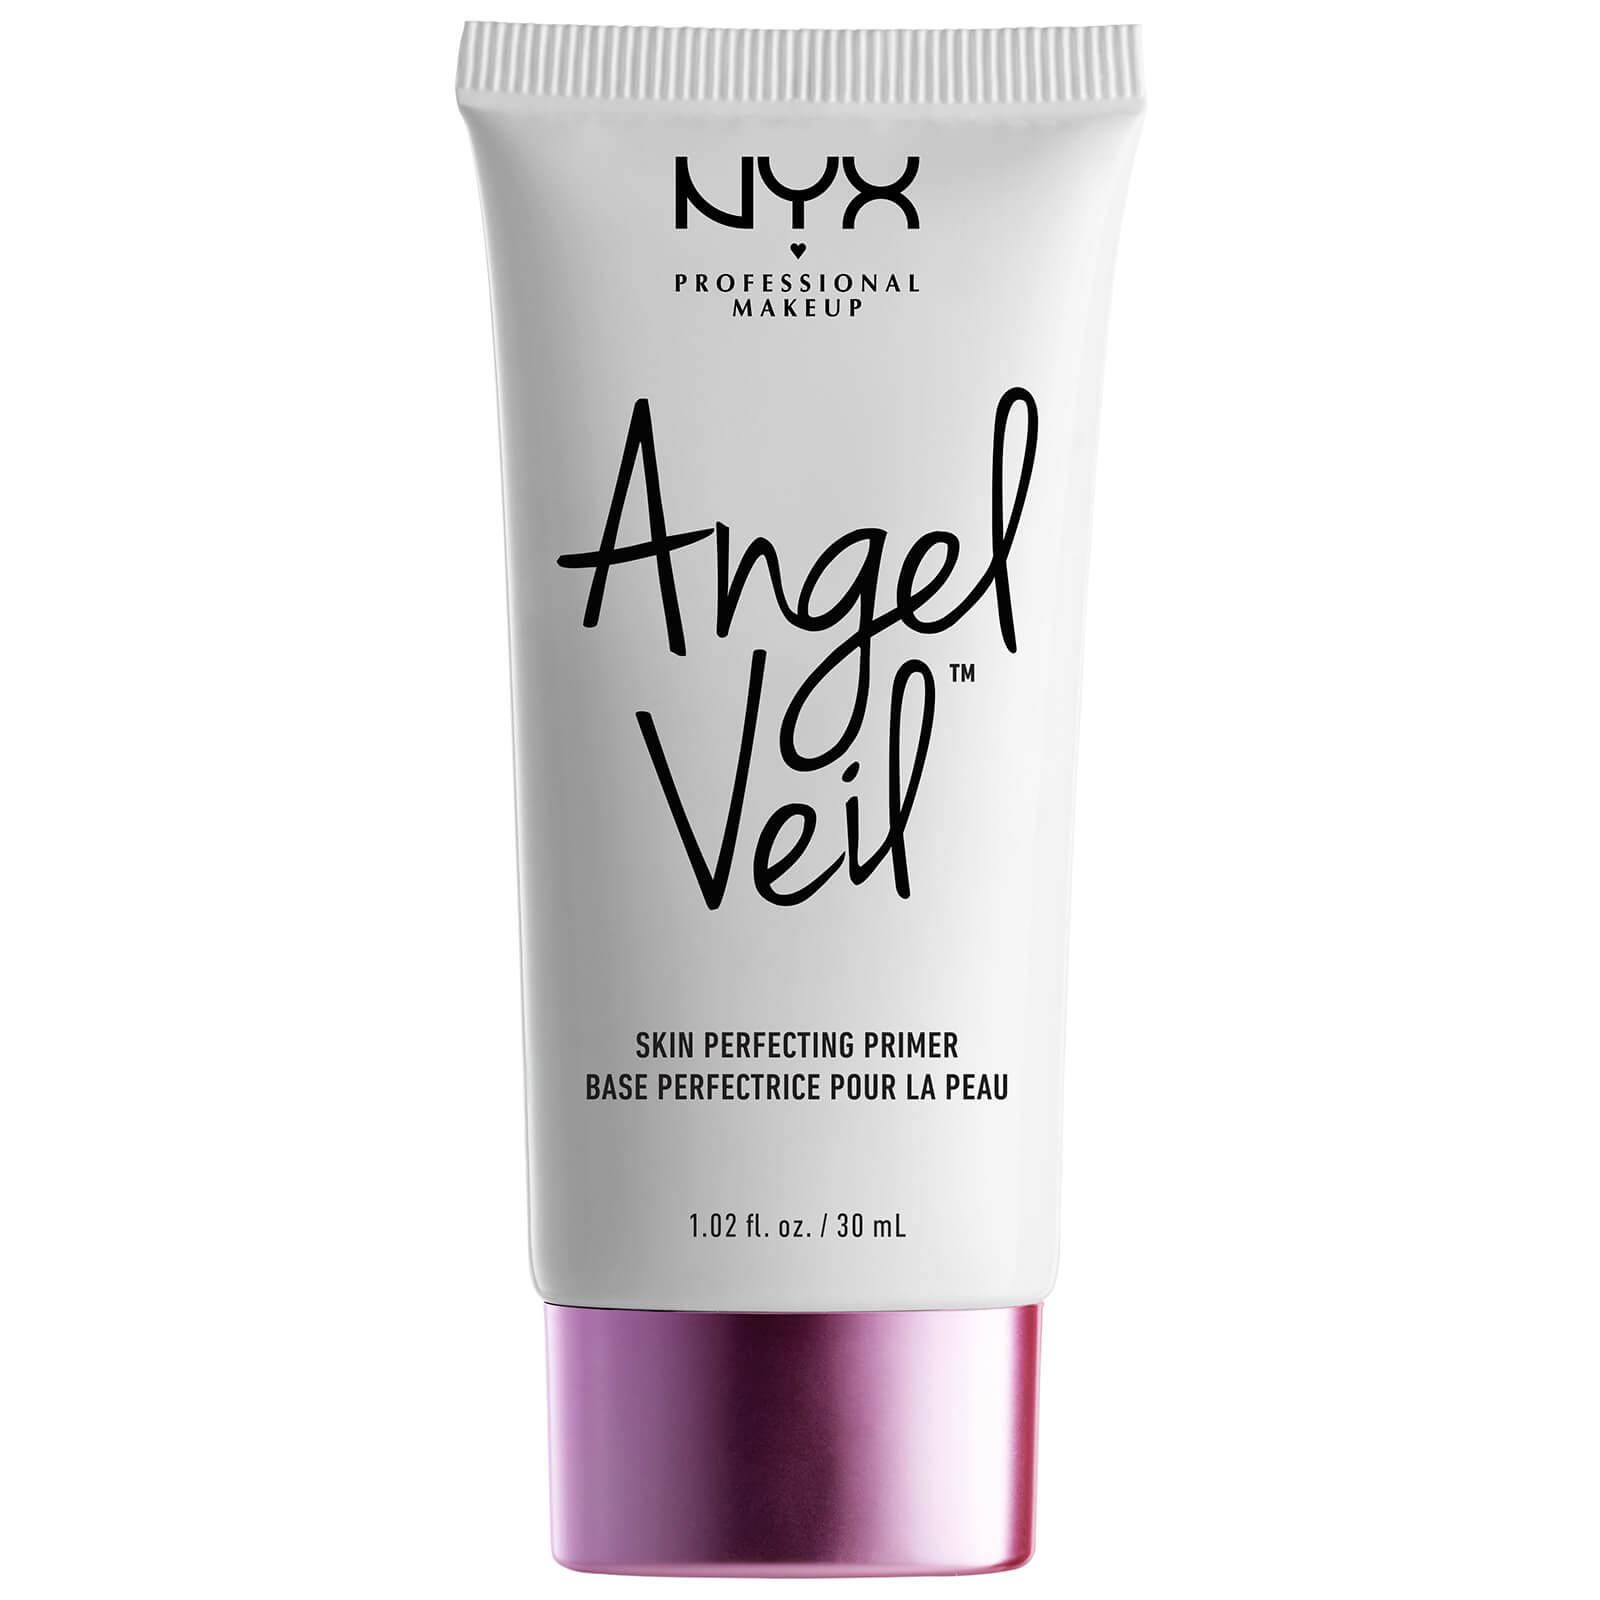 Купить Праймер для лица NYX Professional Makeup Angel Veil Skin Perfecting Primer